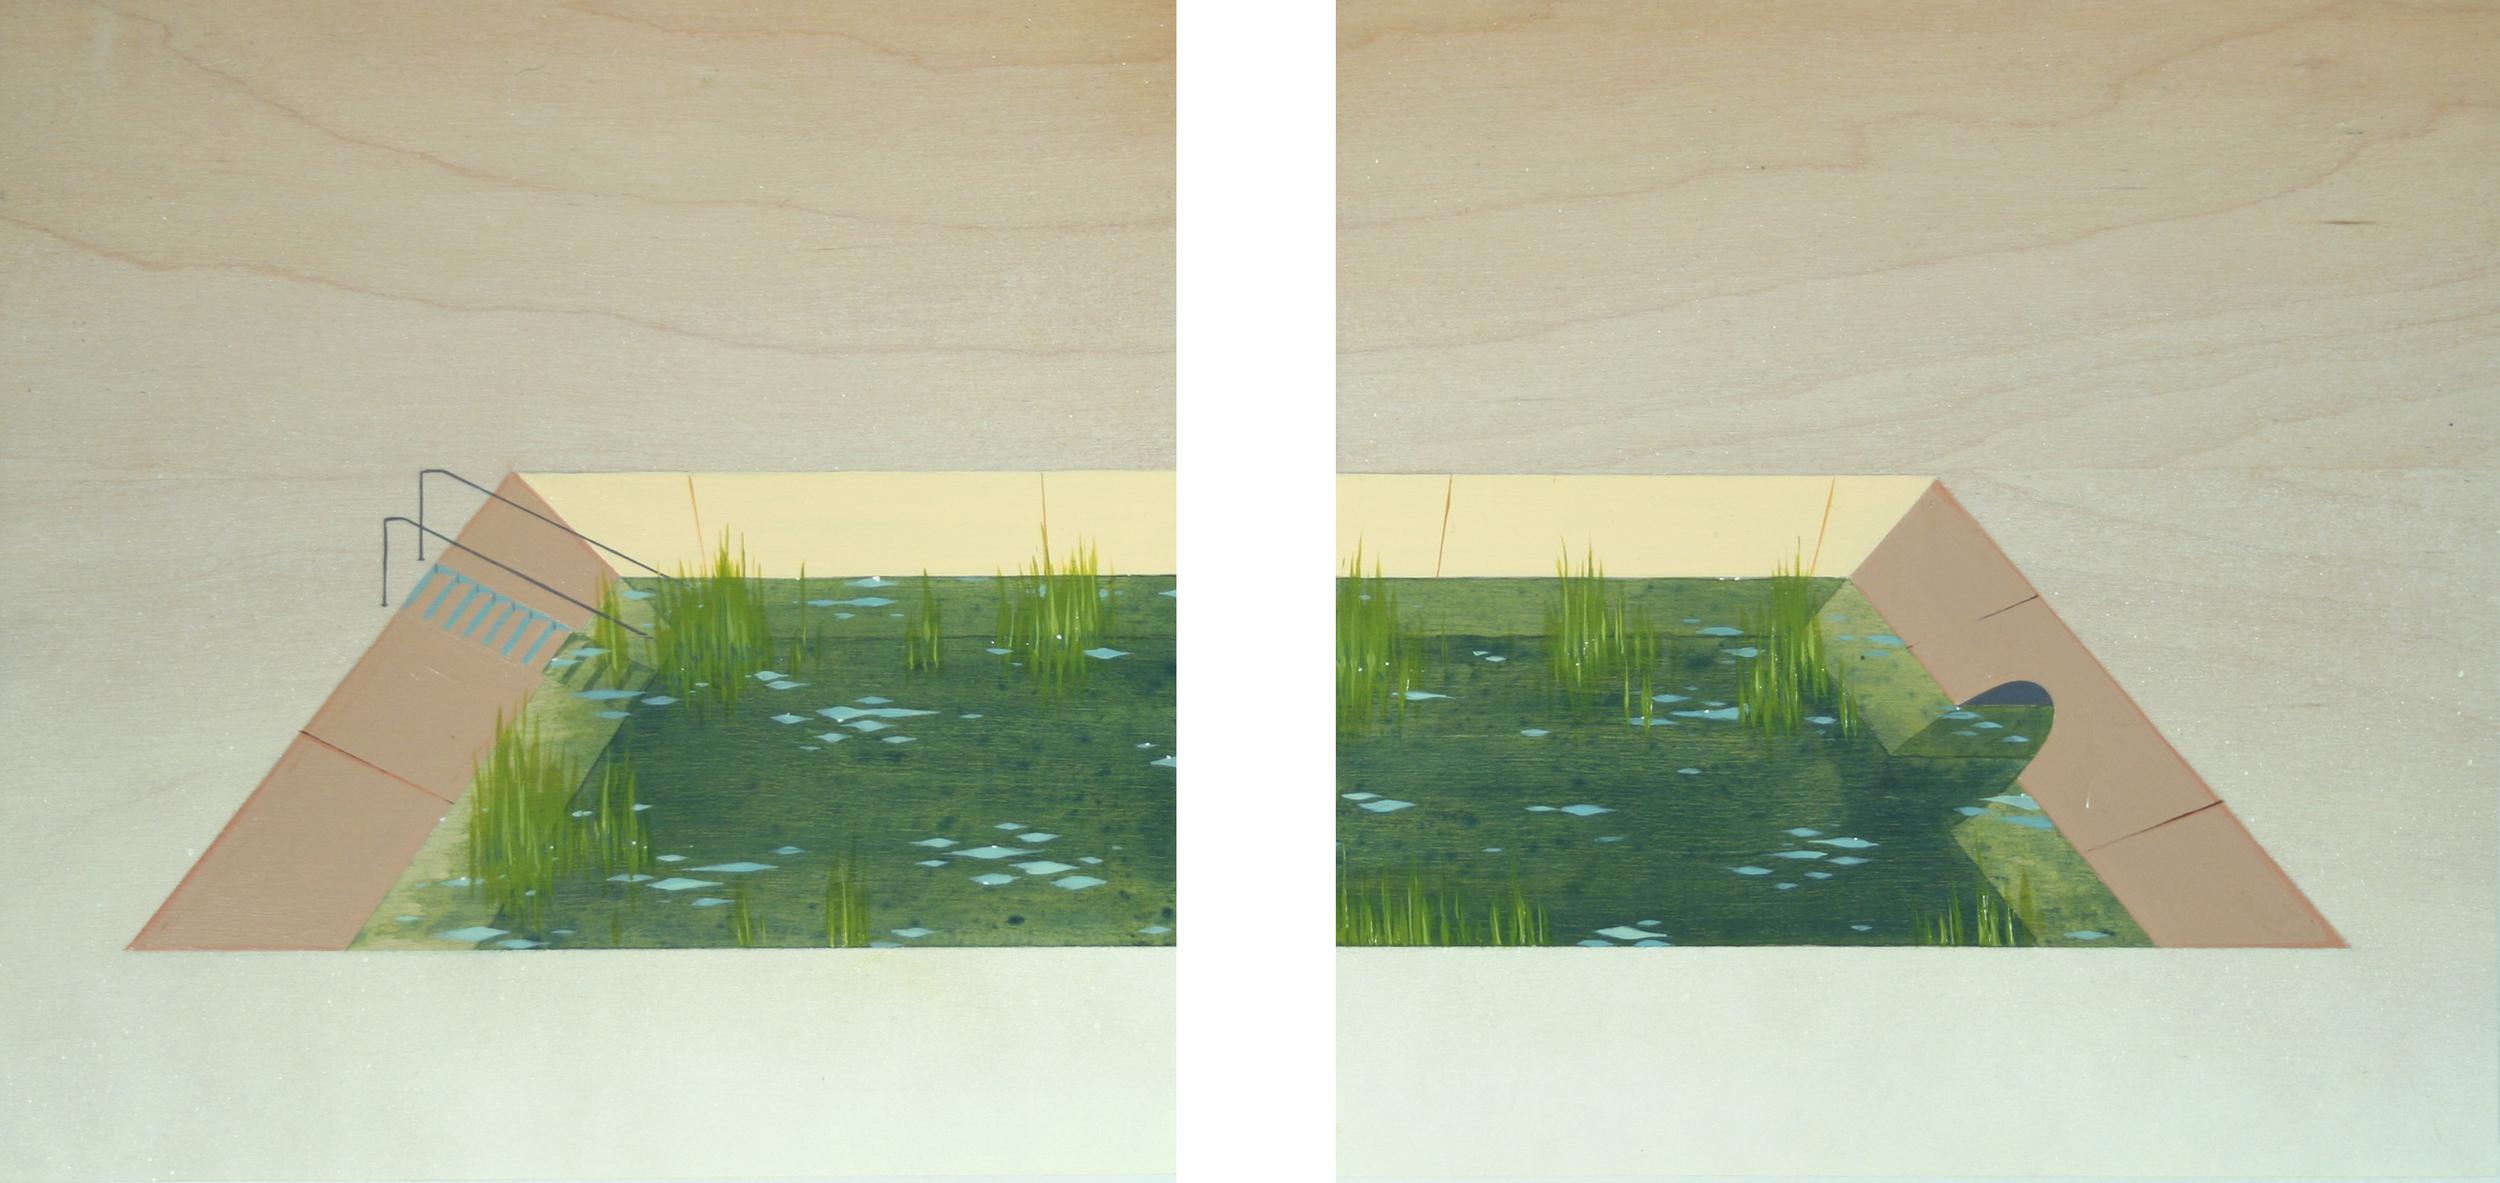 Chris Ballantyne   Pond  (dyptich) 2014 acrylic on panel 10 x 10 in (each)